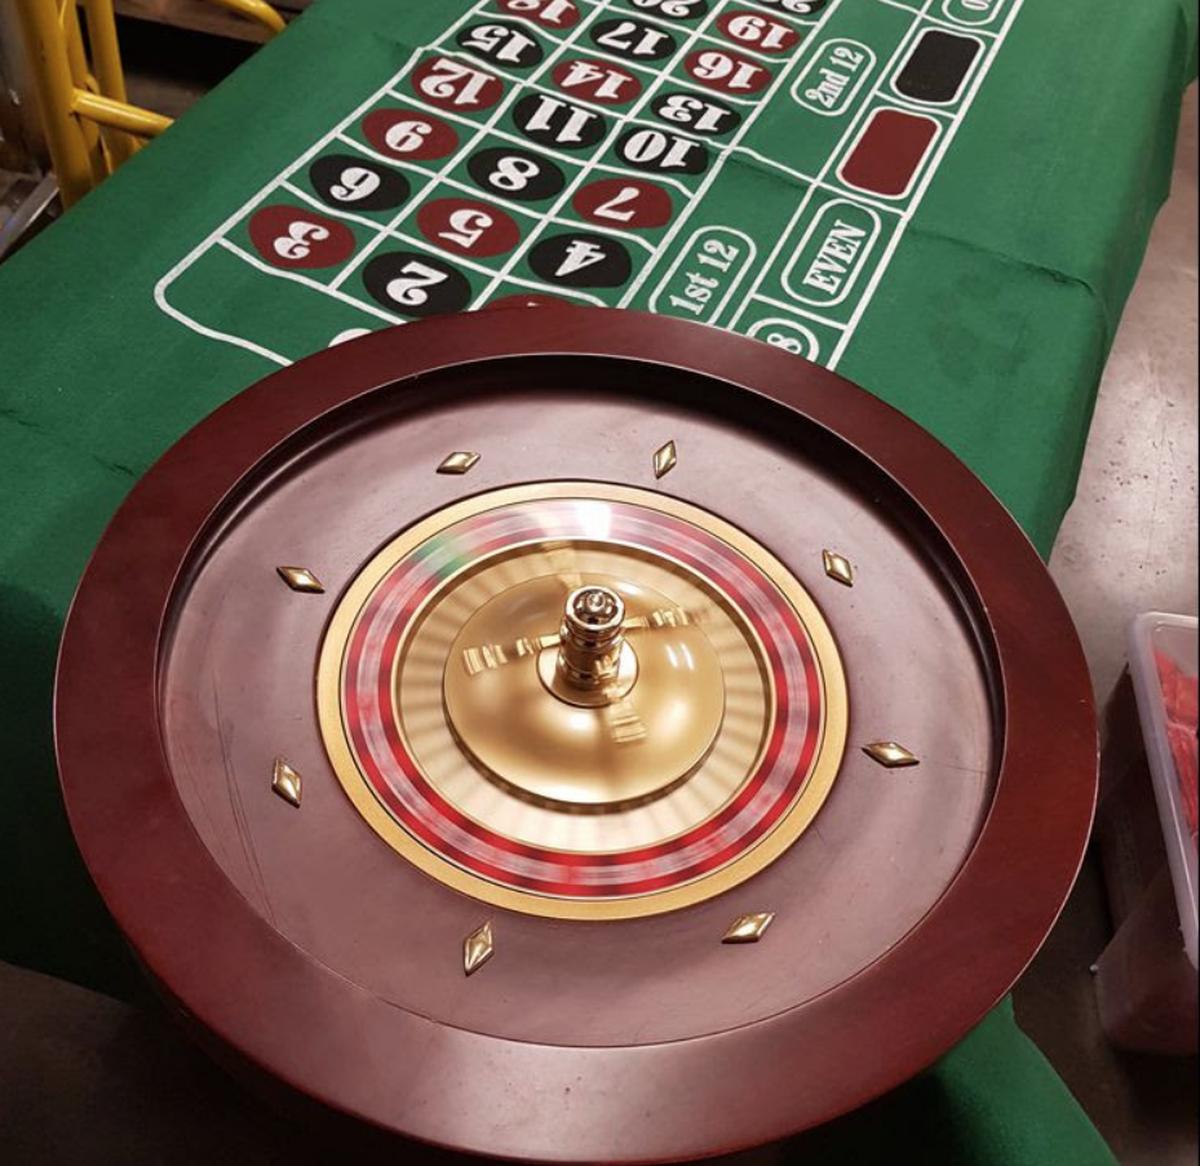 Used roulette tables for sale uk free poker org component socialpoker